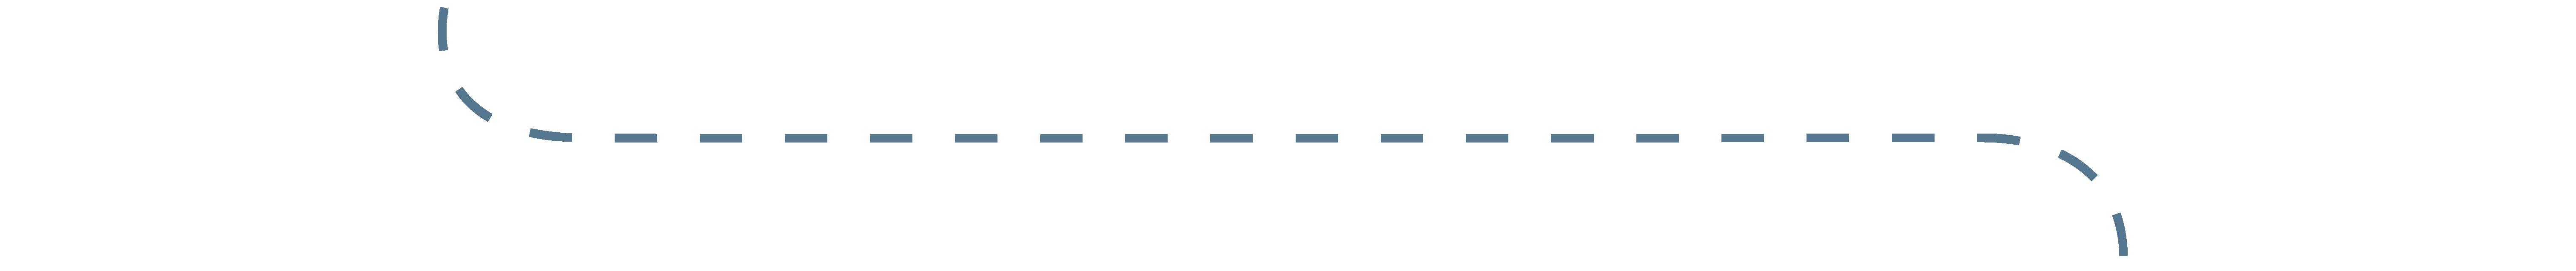 Dotted Line Divider